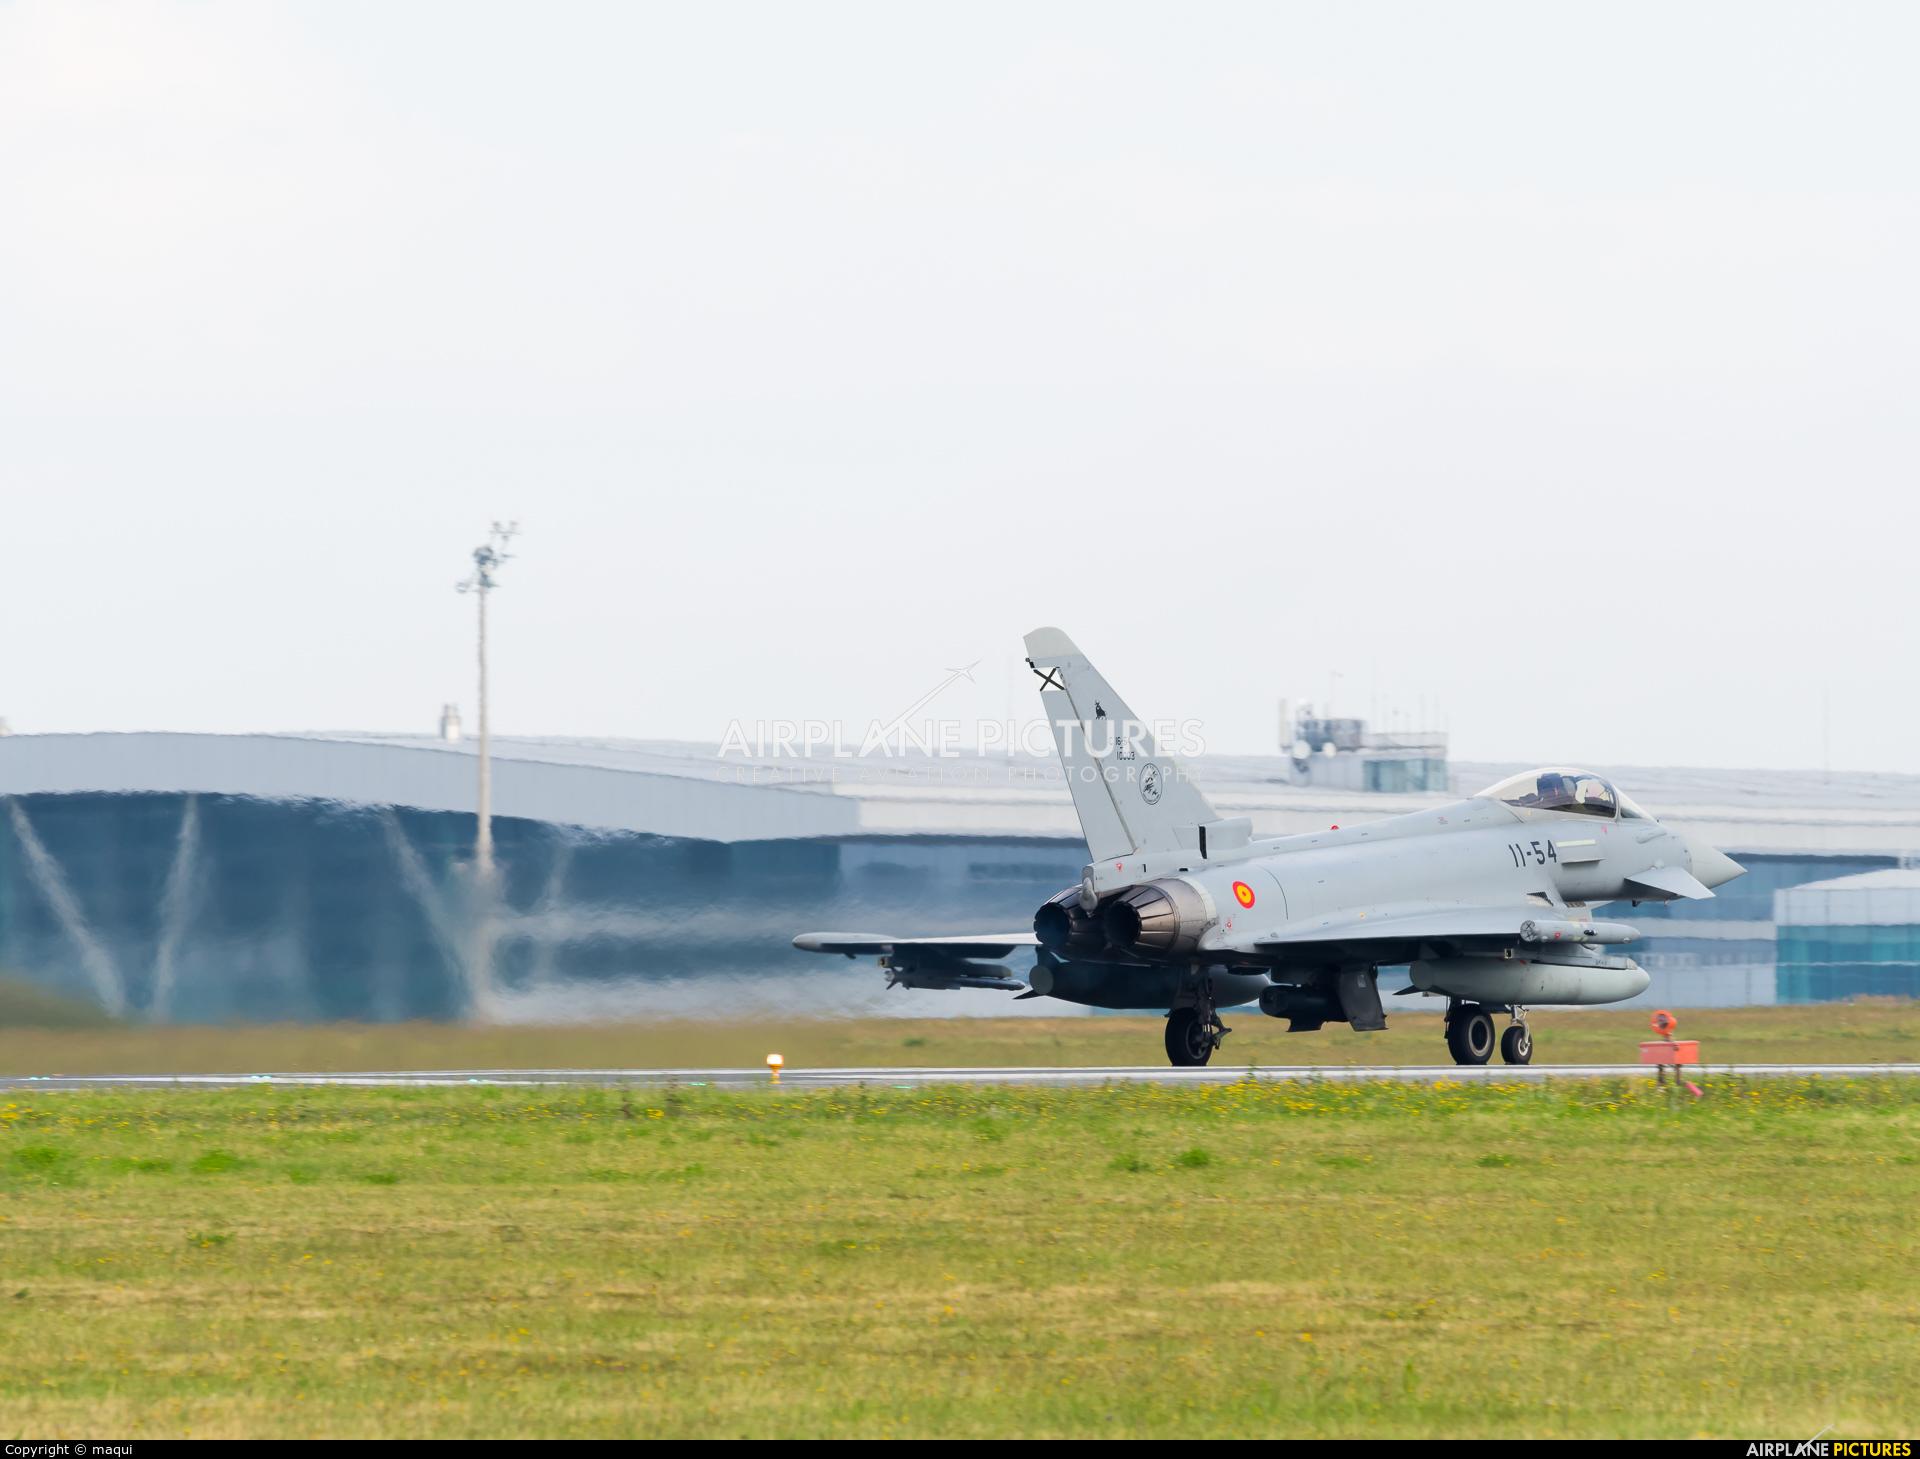 Spain - Air Force C.16-54-10003 aircraft at Santiago de Compostela